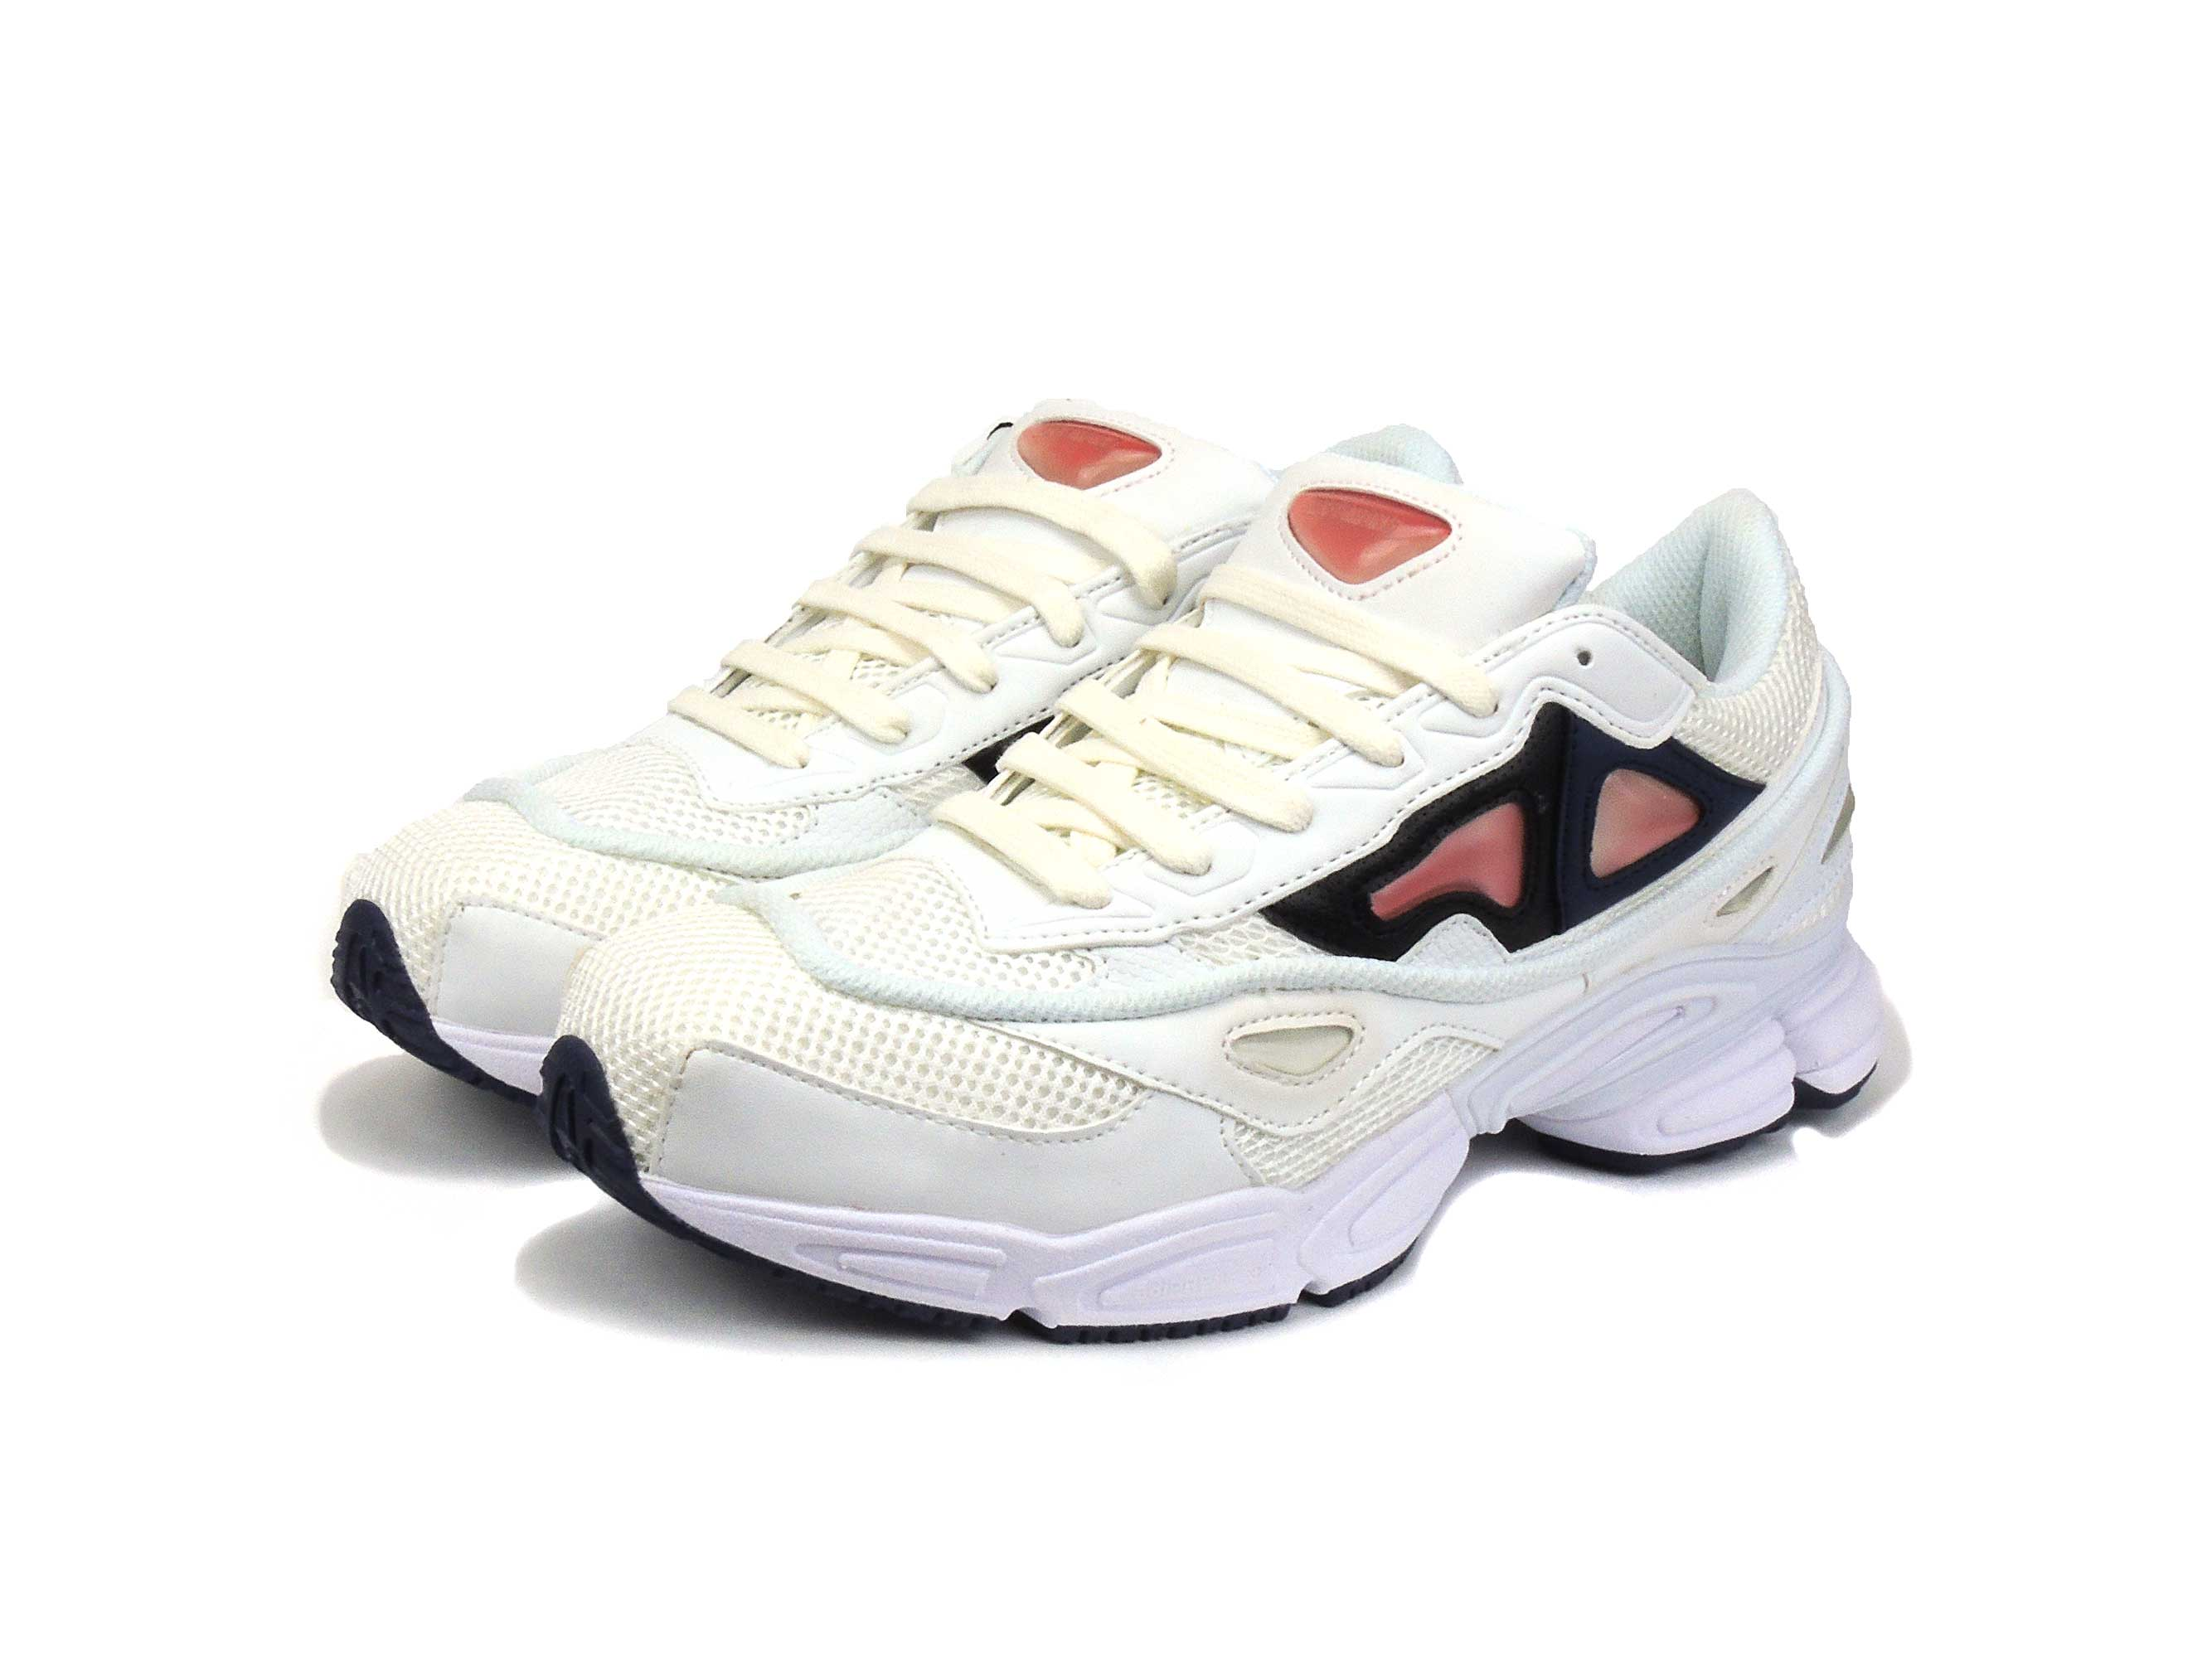 on sale 1ef1e f6ede adidas x Raf Simons ozweego white pink